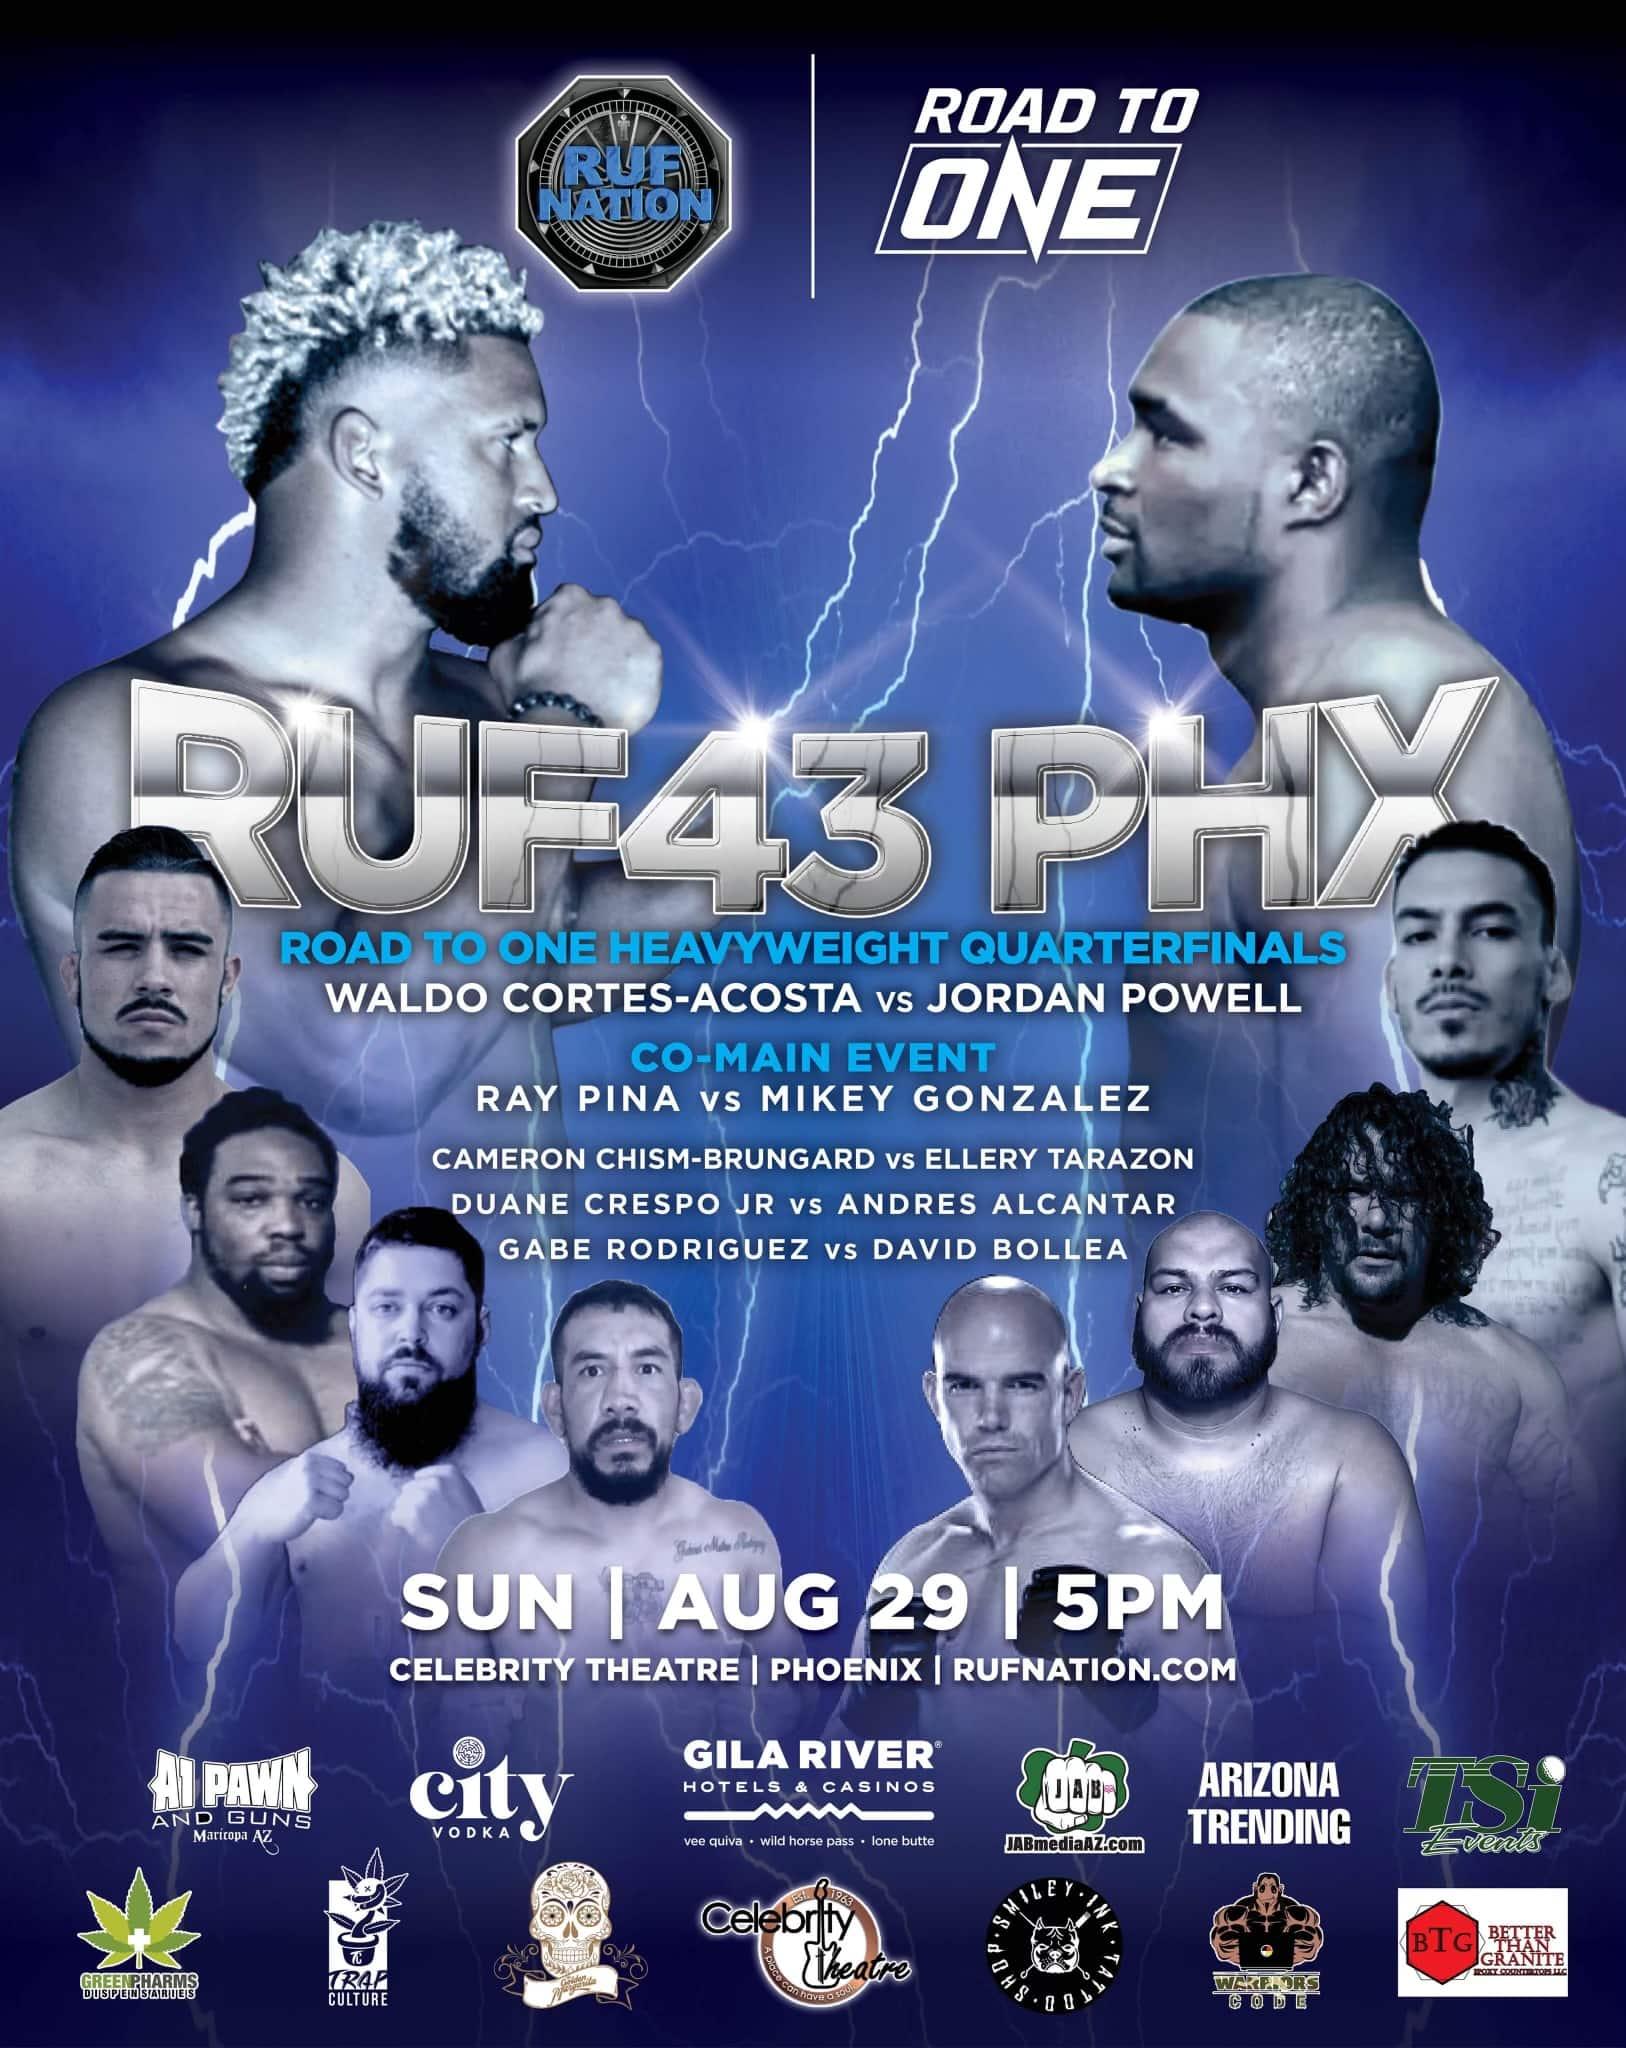 RUF43 PHX sun aug 29 - MMA Fight Coverage